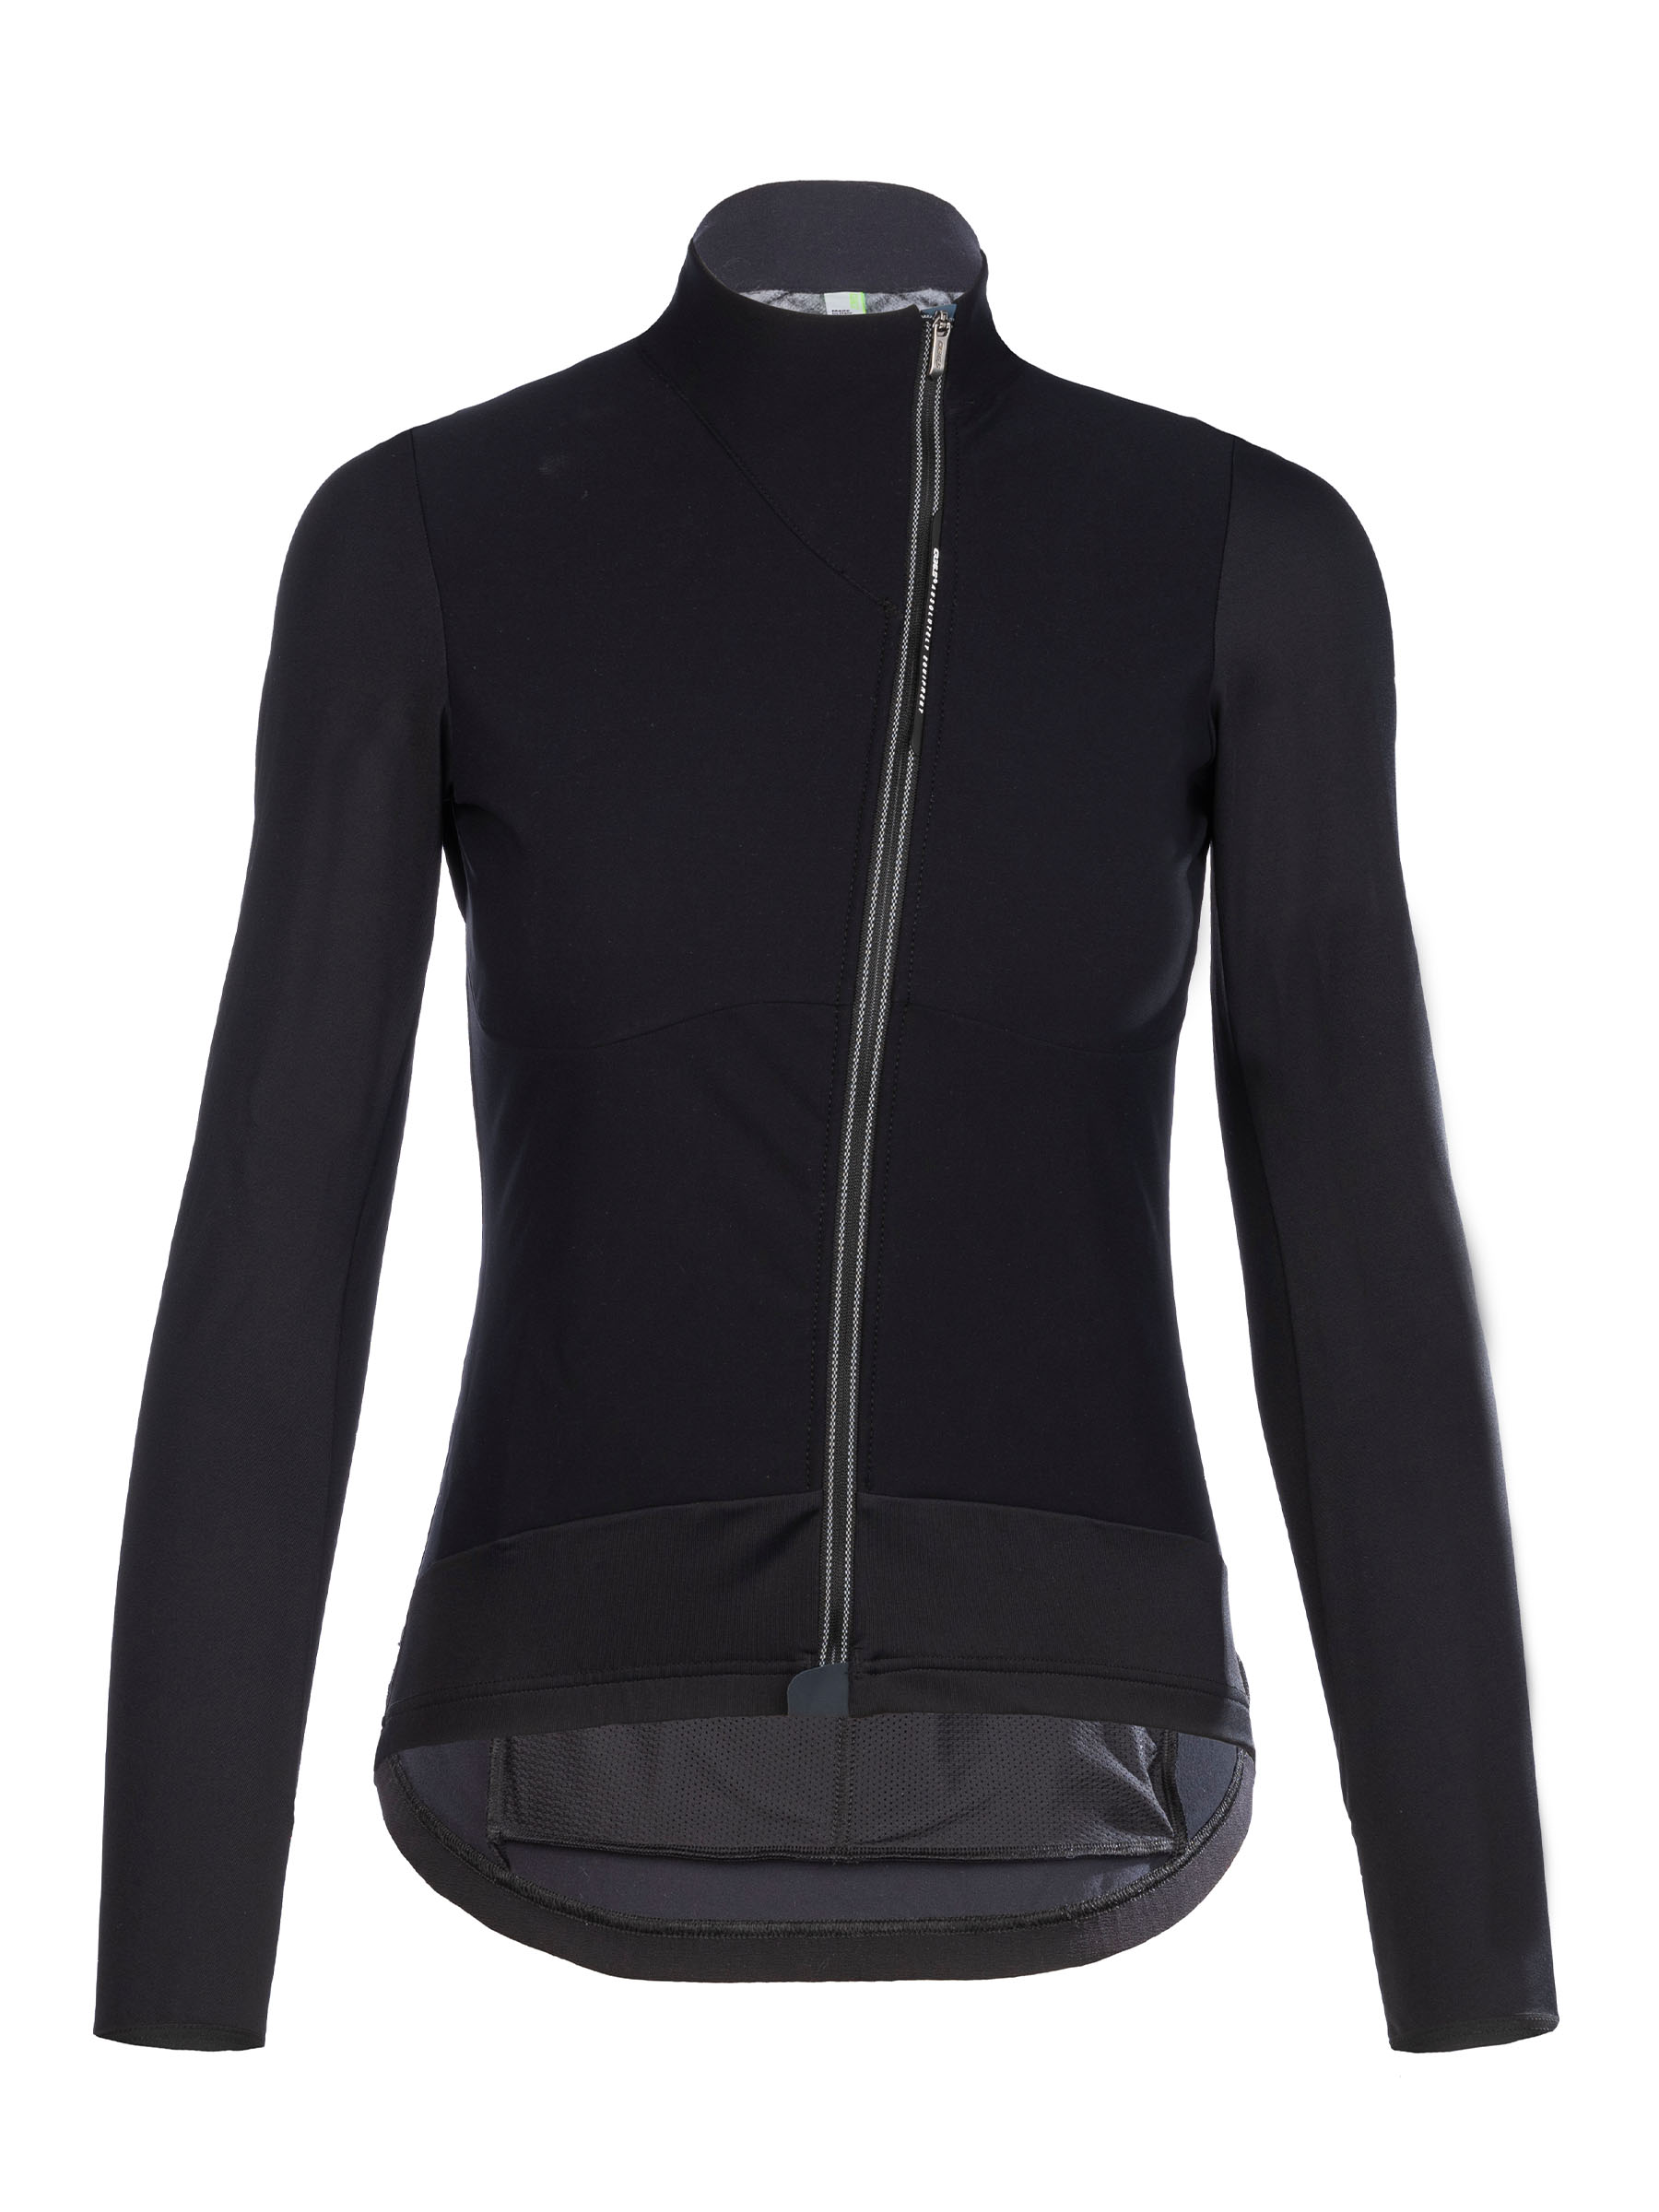 Chaqueta ciclismo mujer Hybrid Jacket Lady negra